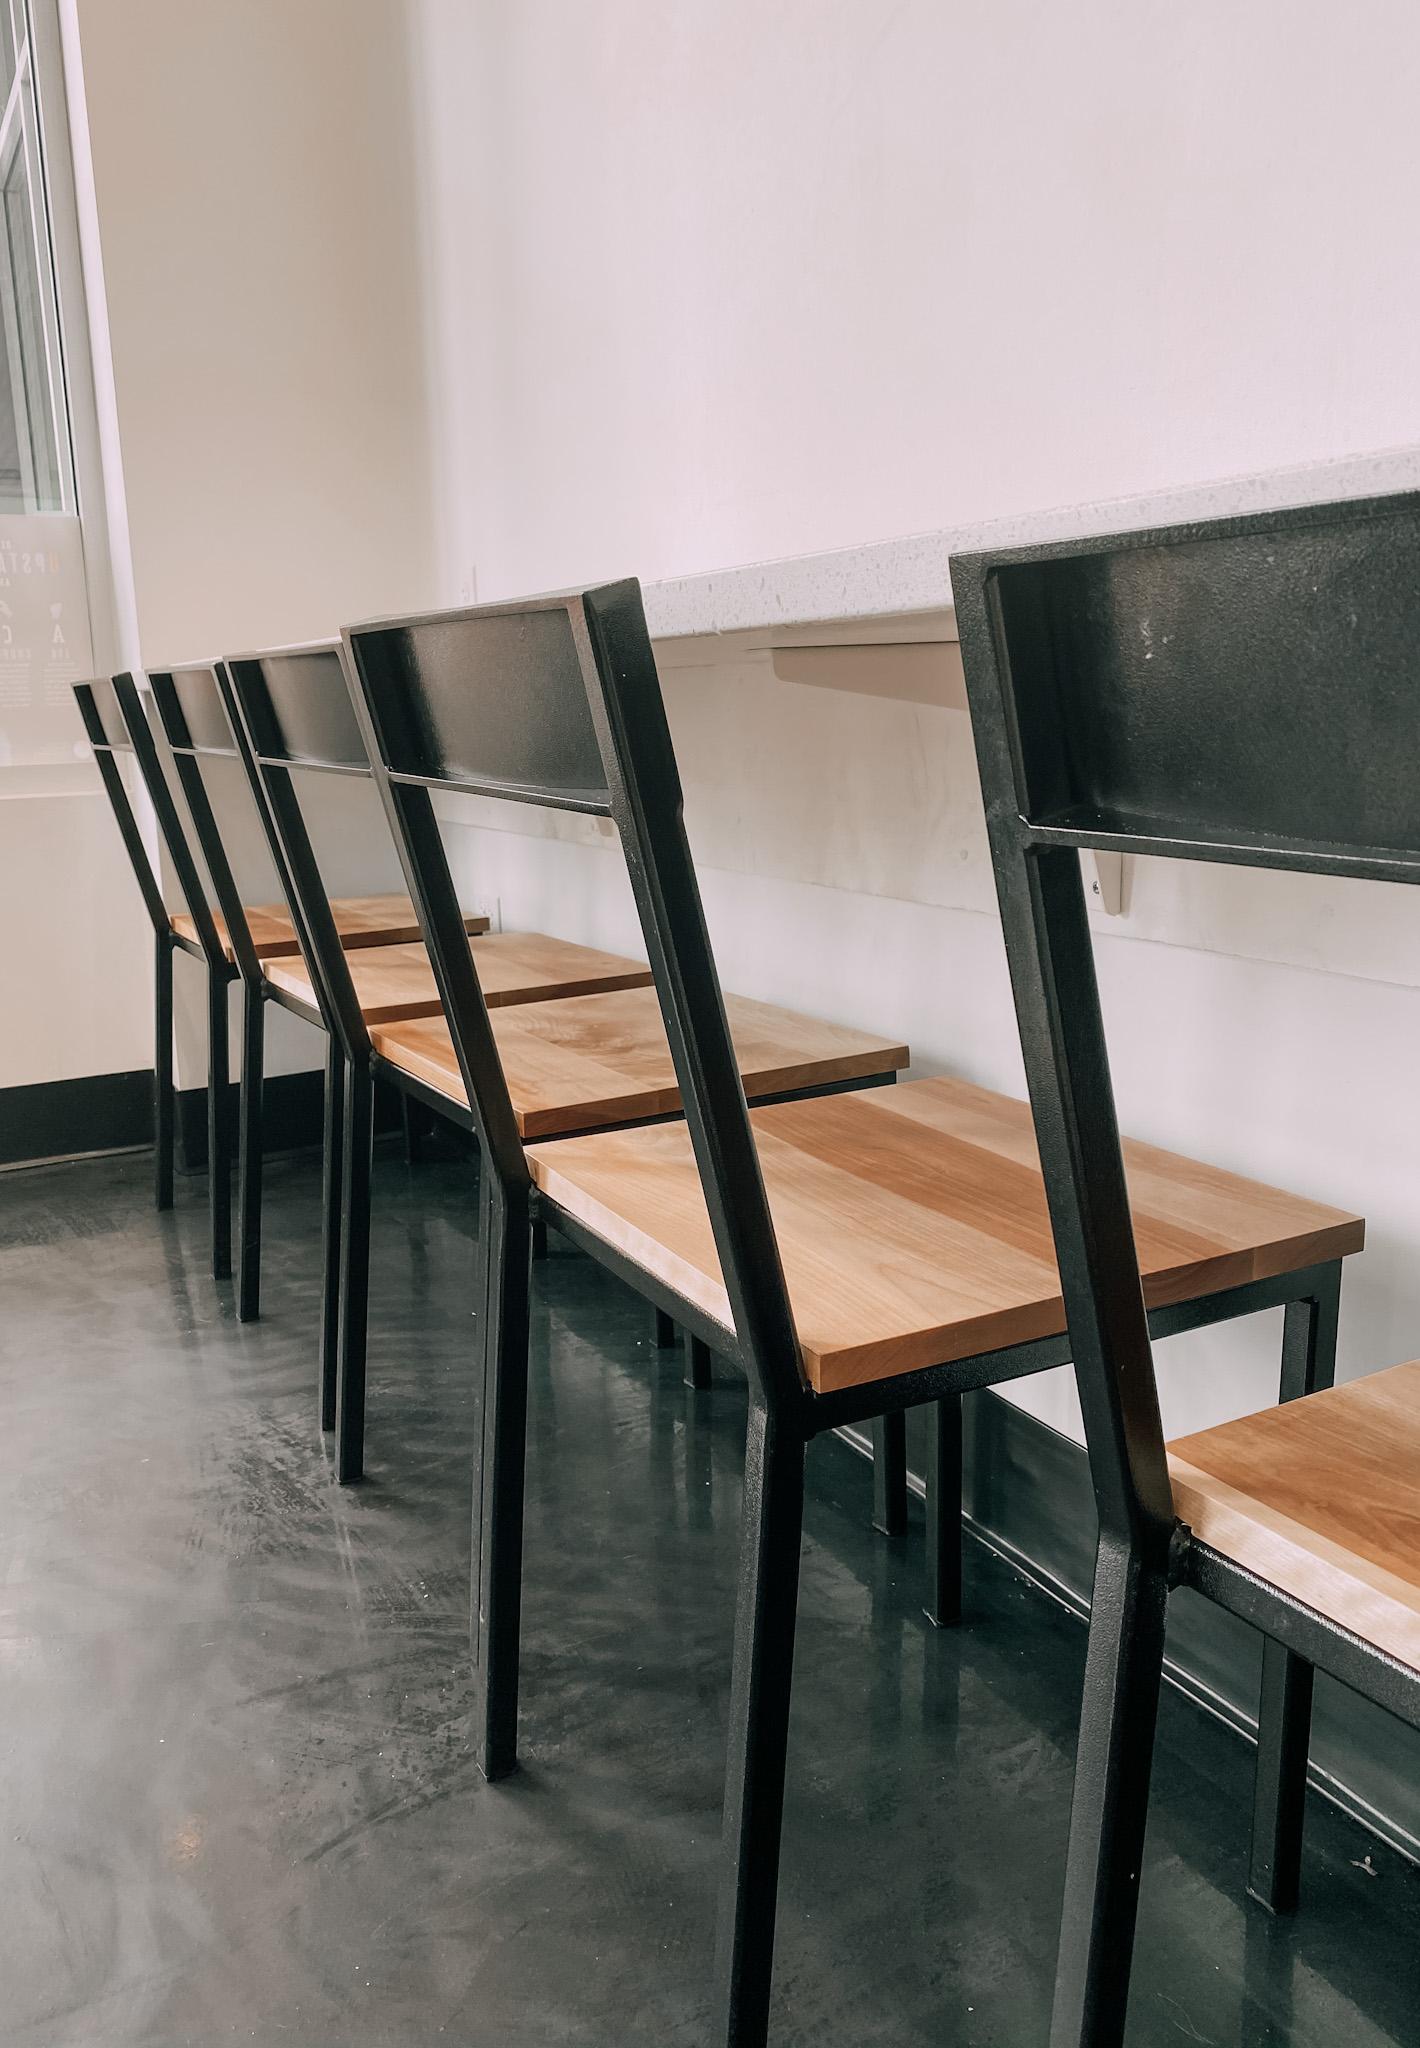 Boise Chairs